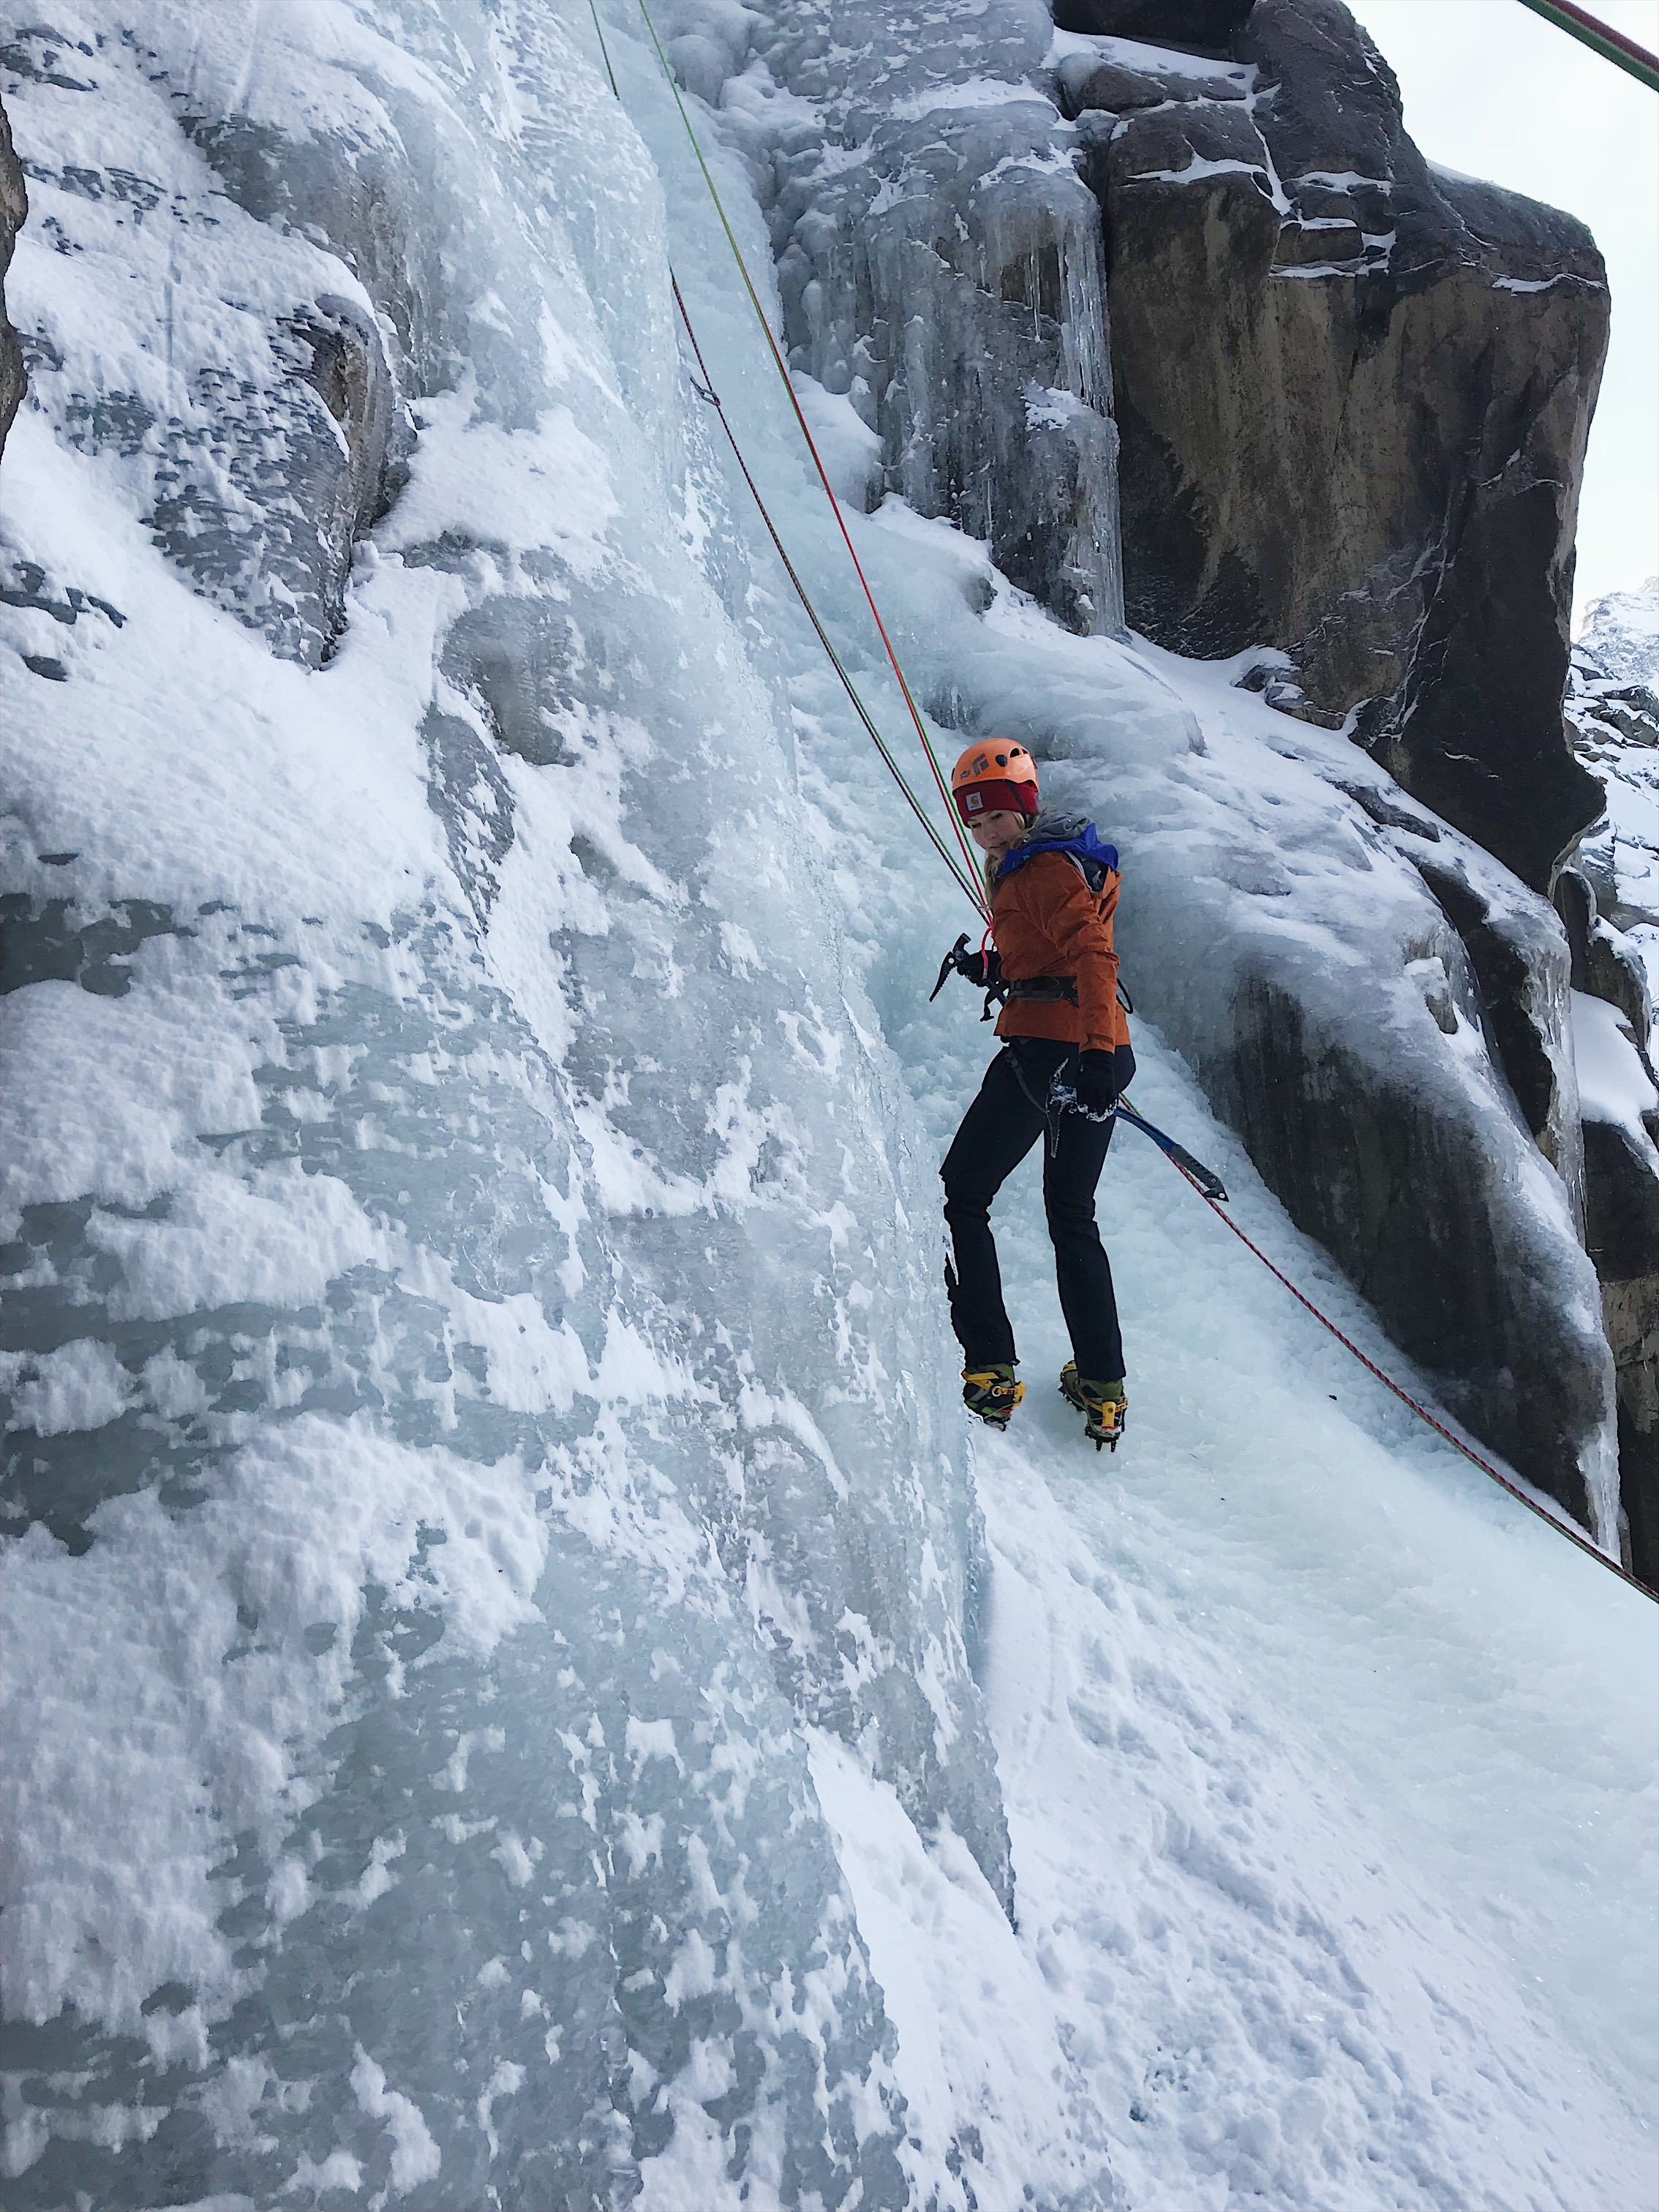 cogne ice climbing adventure base